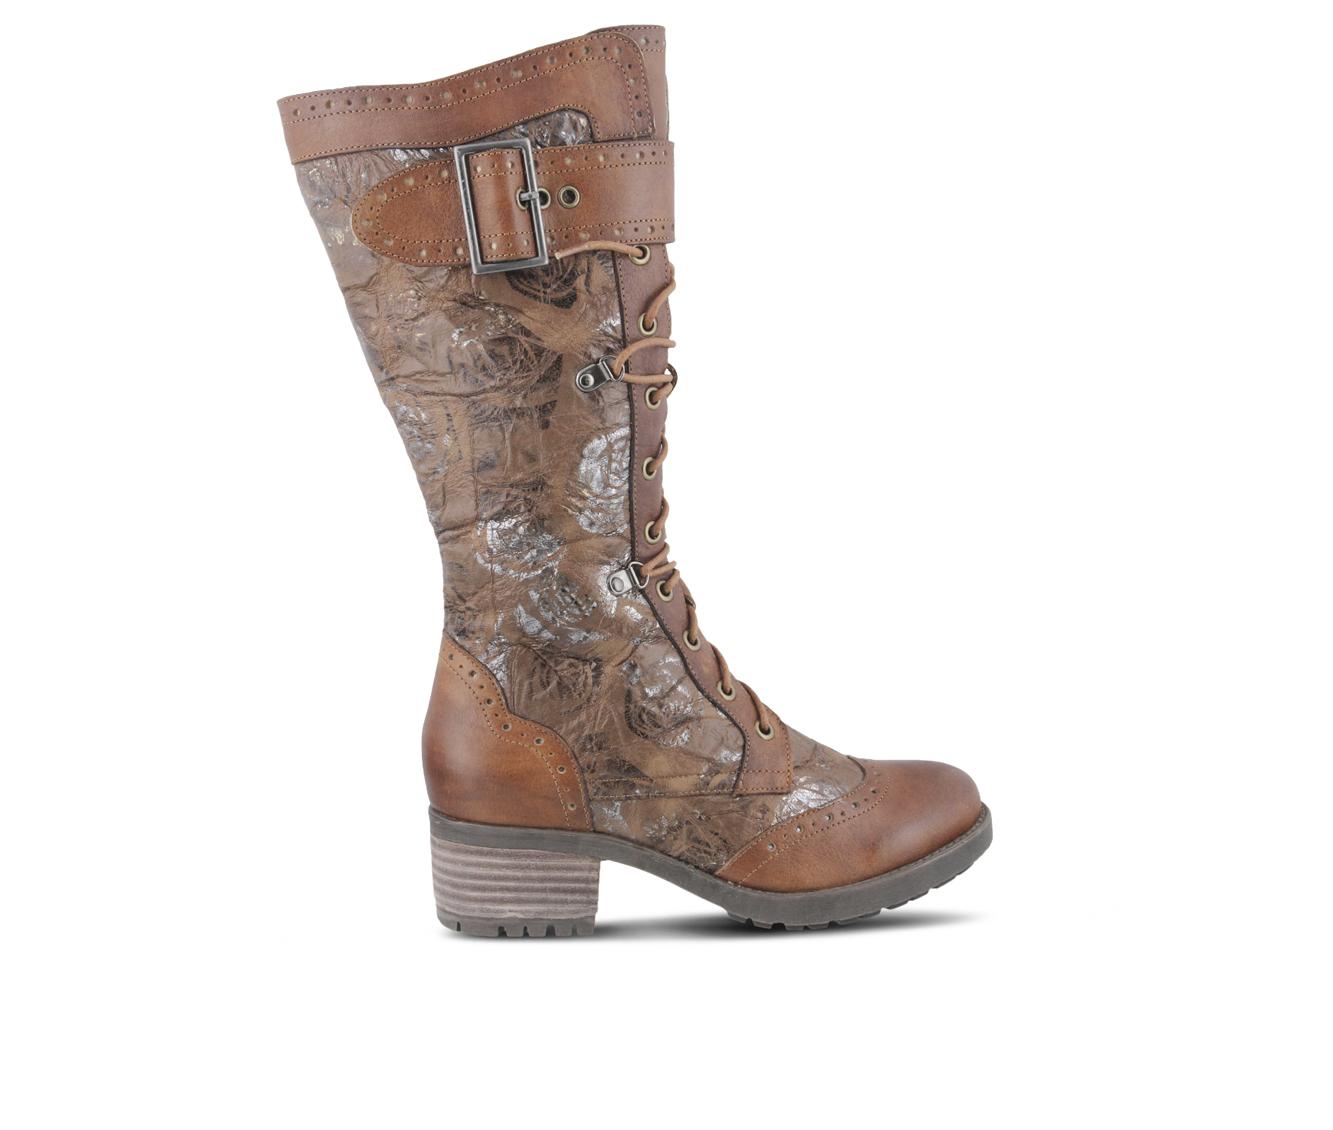 L'Artiste Kisha Women's Boots (Brown Leather)